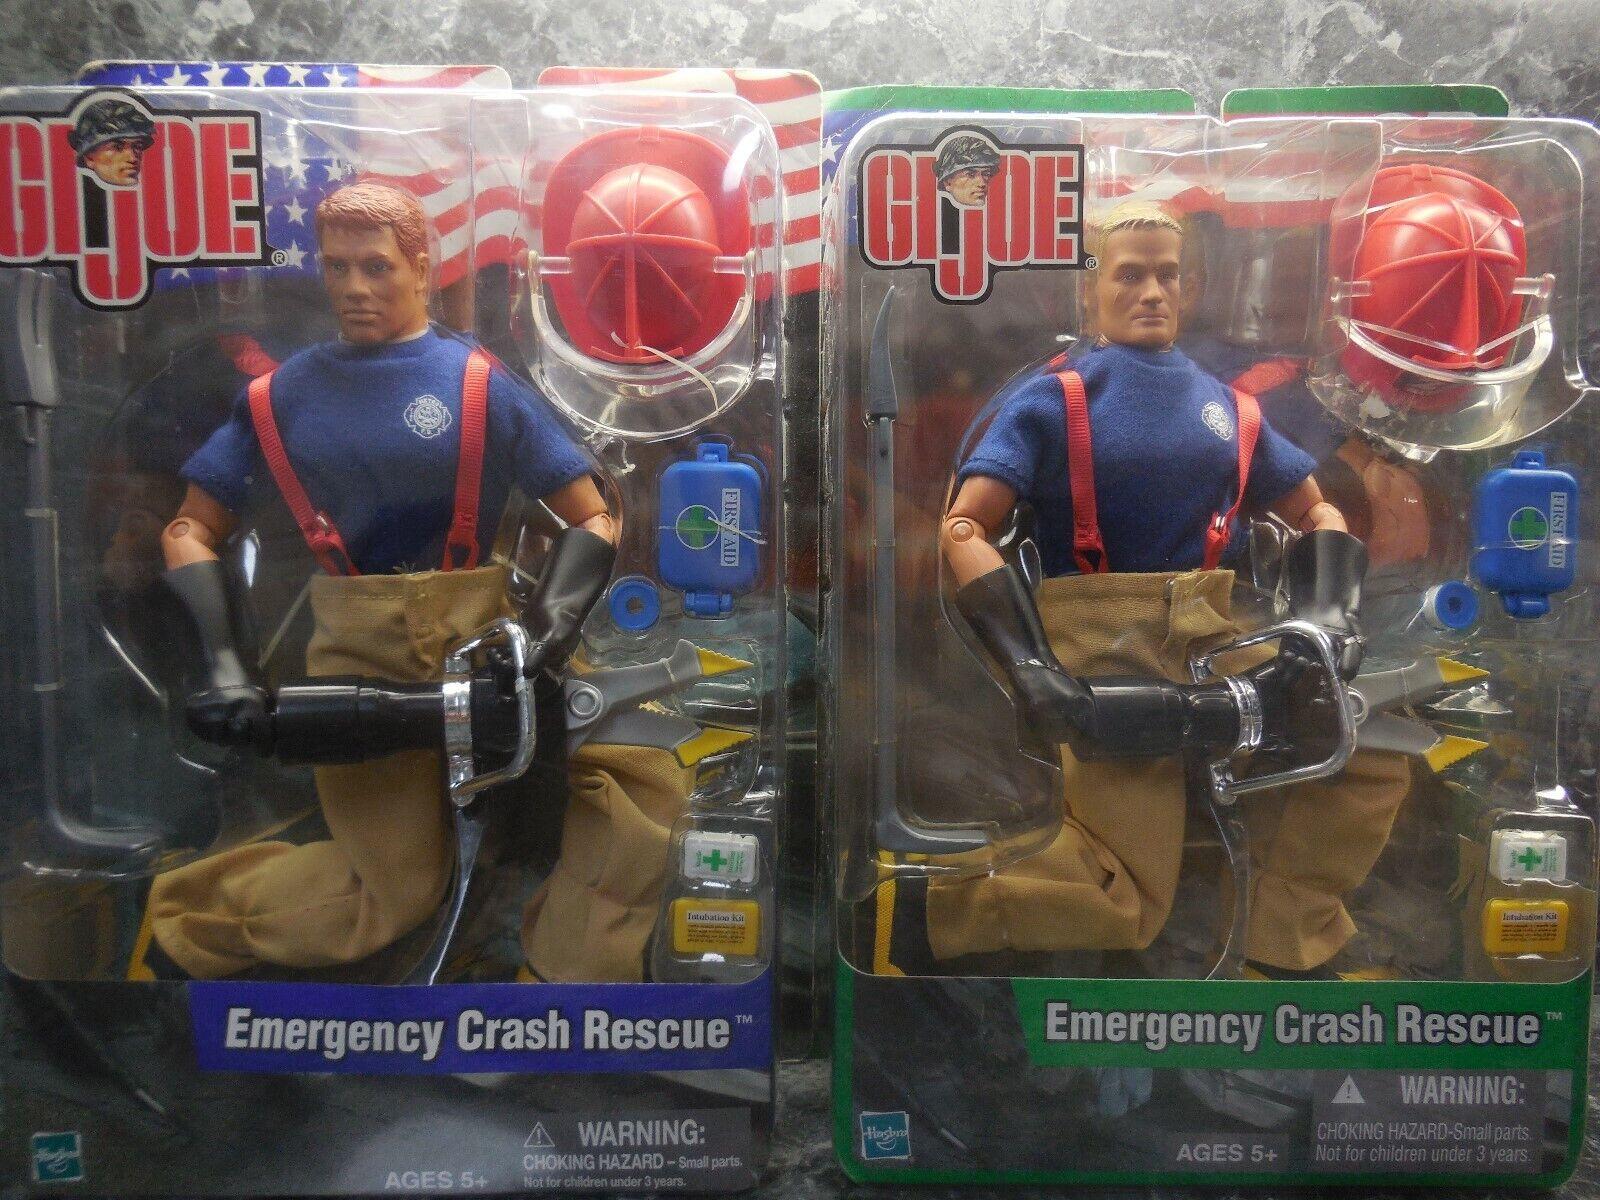 2 g.i. joe emergency crash rescue firefighters  new